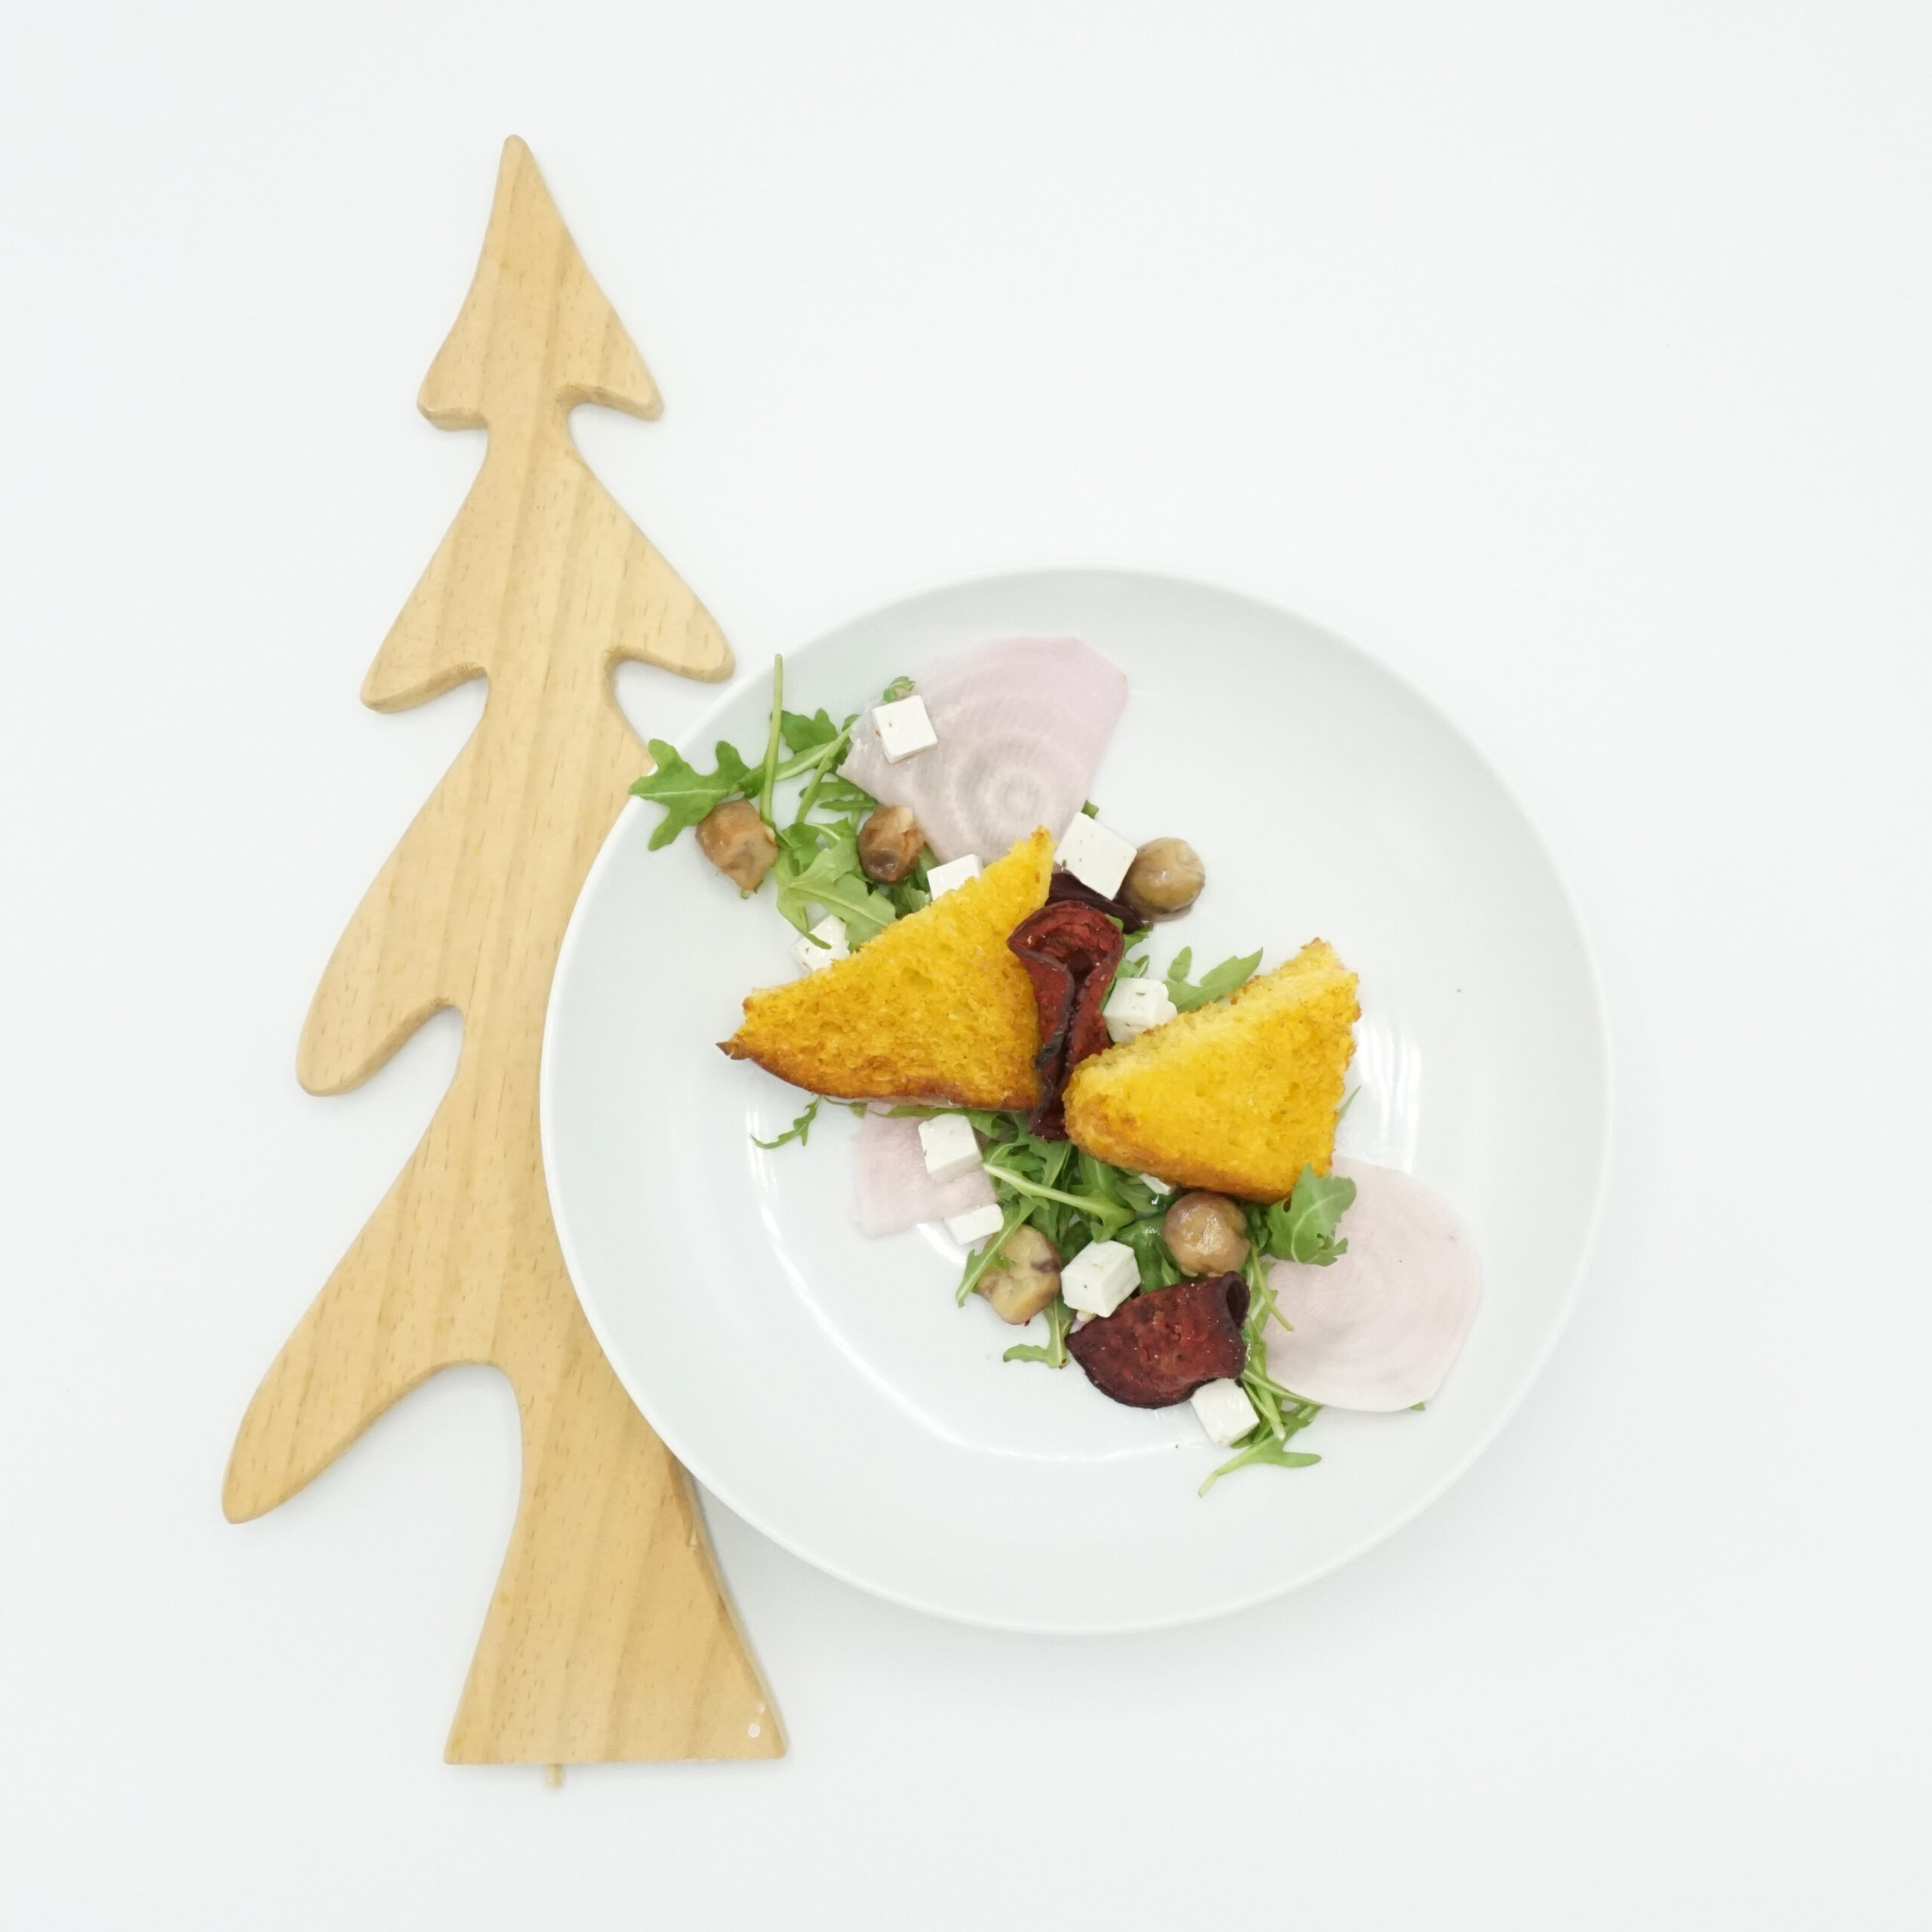 Kerstdiner - Restaurant Vroeg